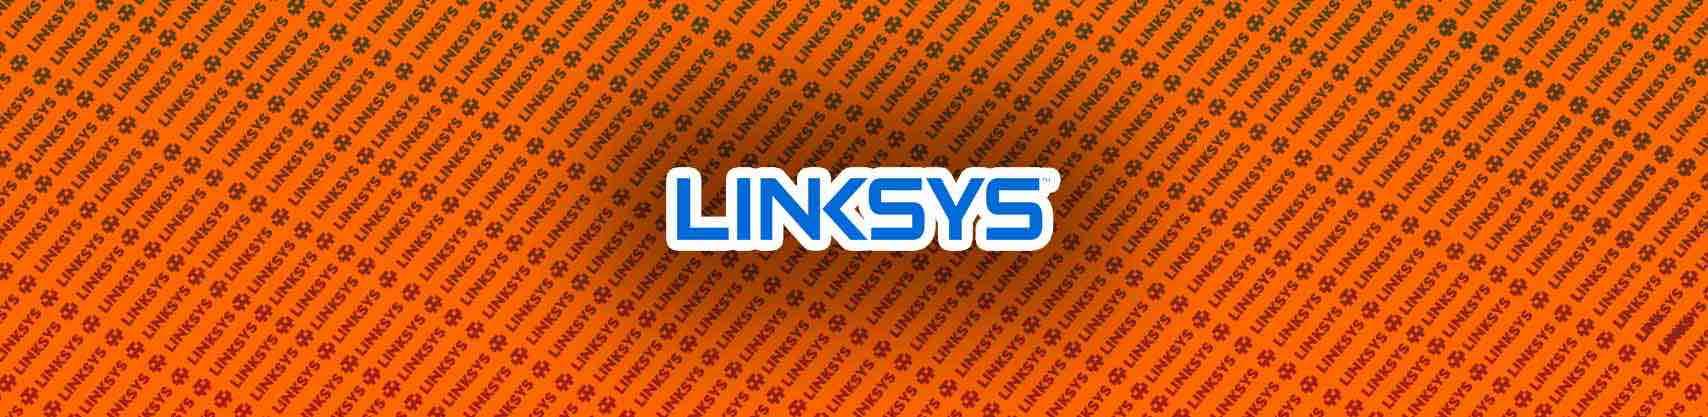 Linksys E3200 Manual